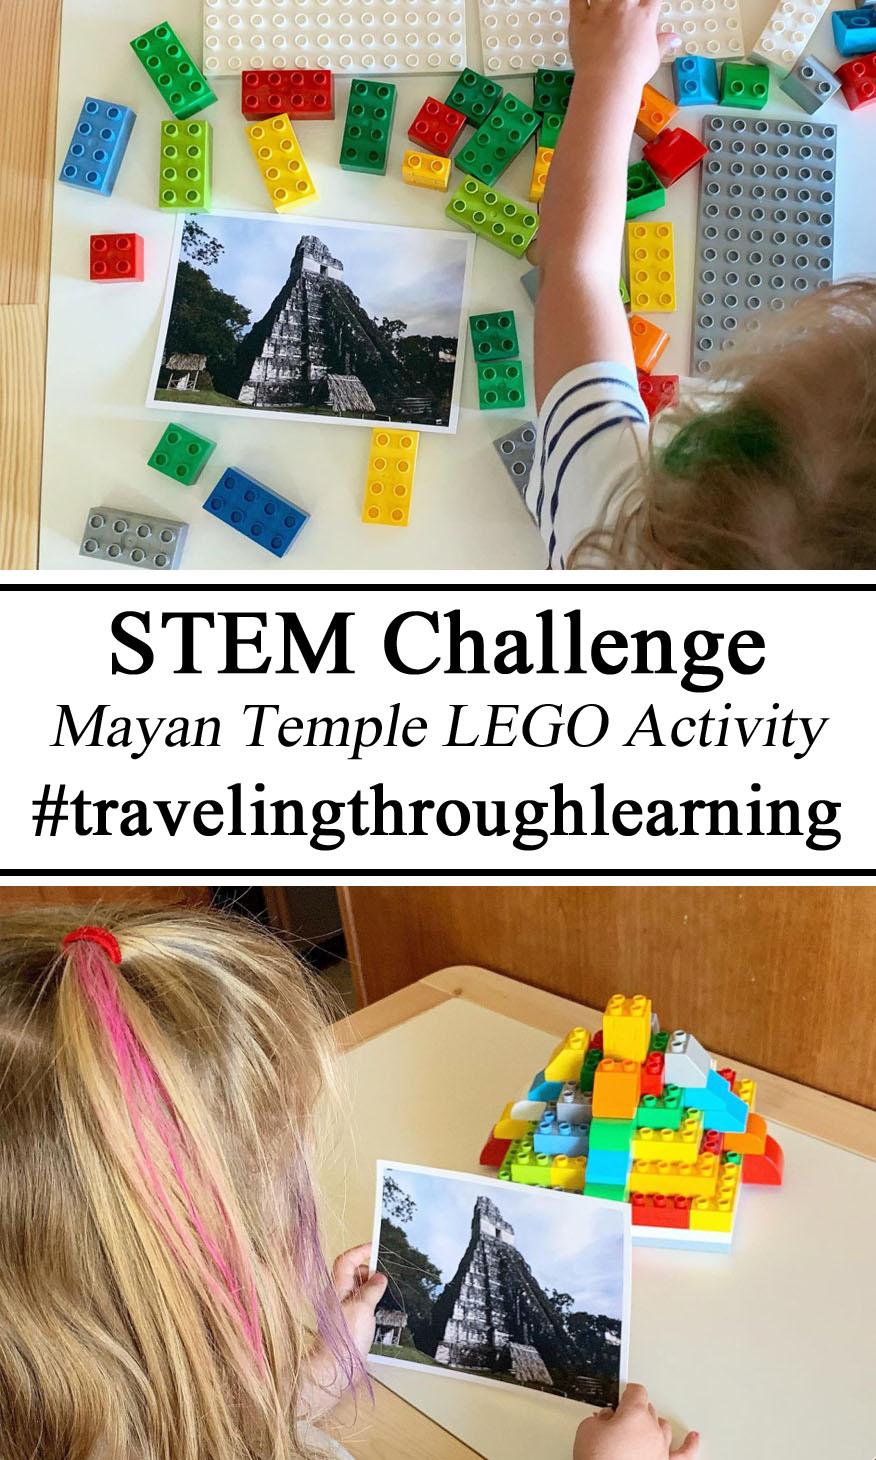 Maya Mayan Unit Study Studies Guatemala Guatemala Temple Ruins Lego Duplo Activity STEM Challenge Activity Learning Learn Get Creative With Homeschool Homeschooling, Ideas Inspiration Montessori